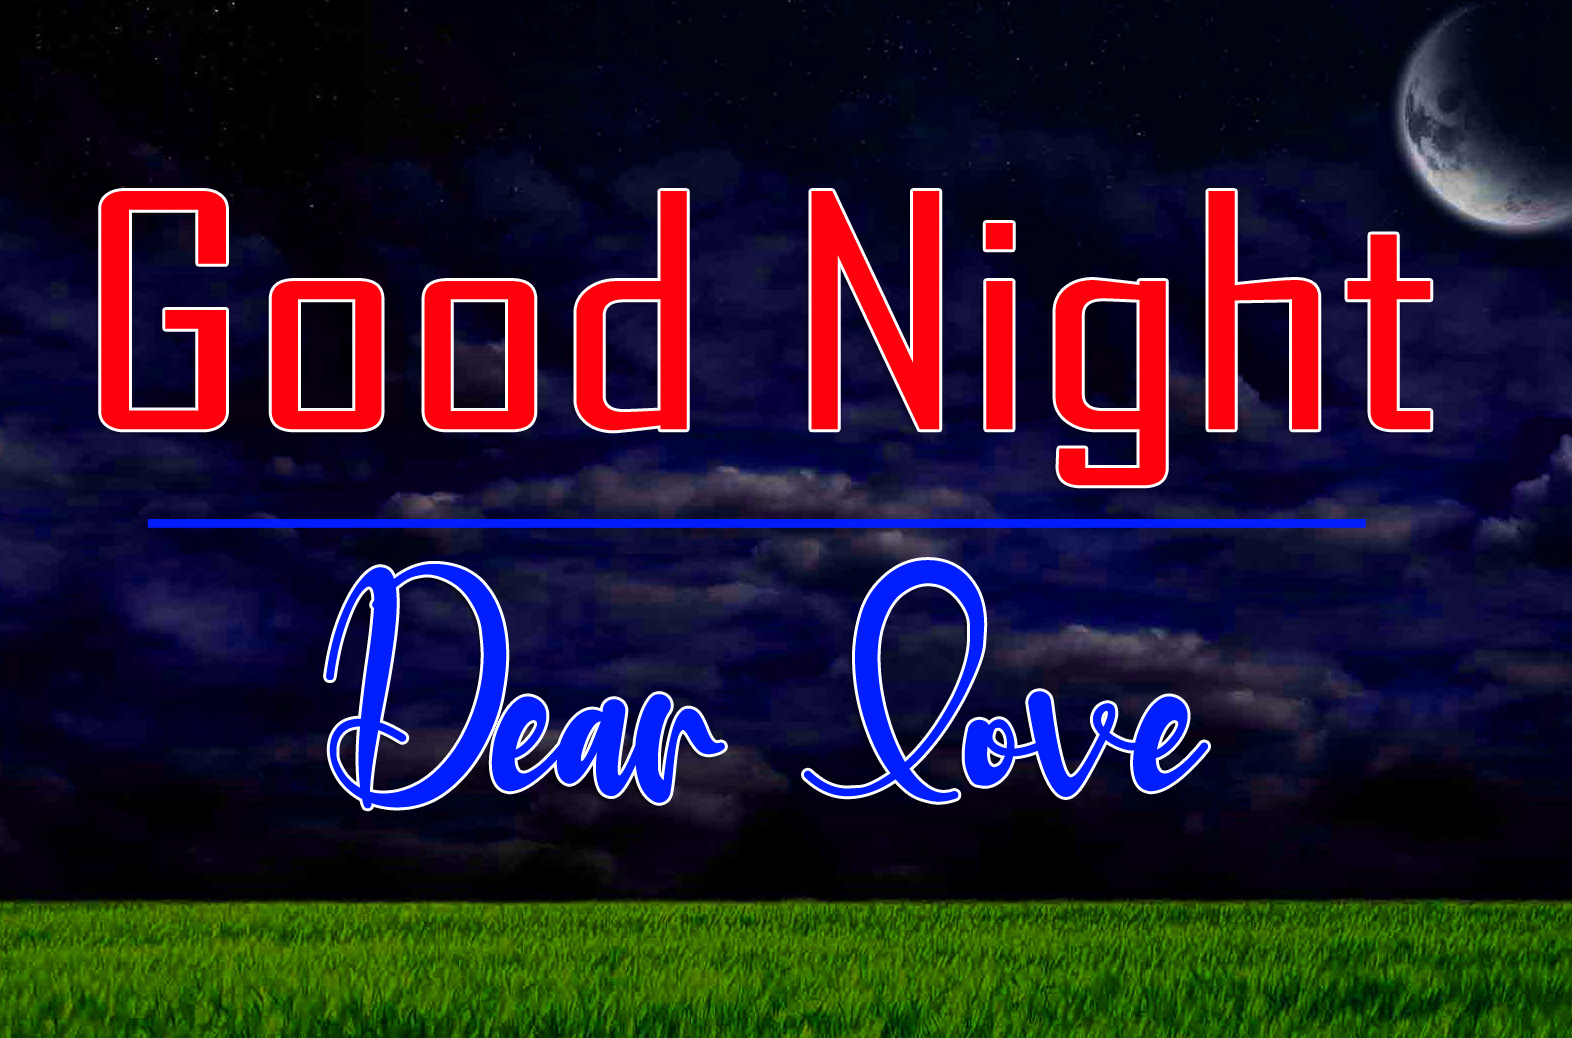 Free Full HD 4k Good Night Images Pics Download